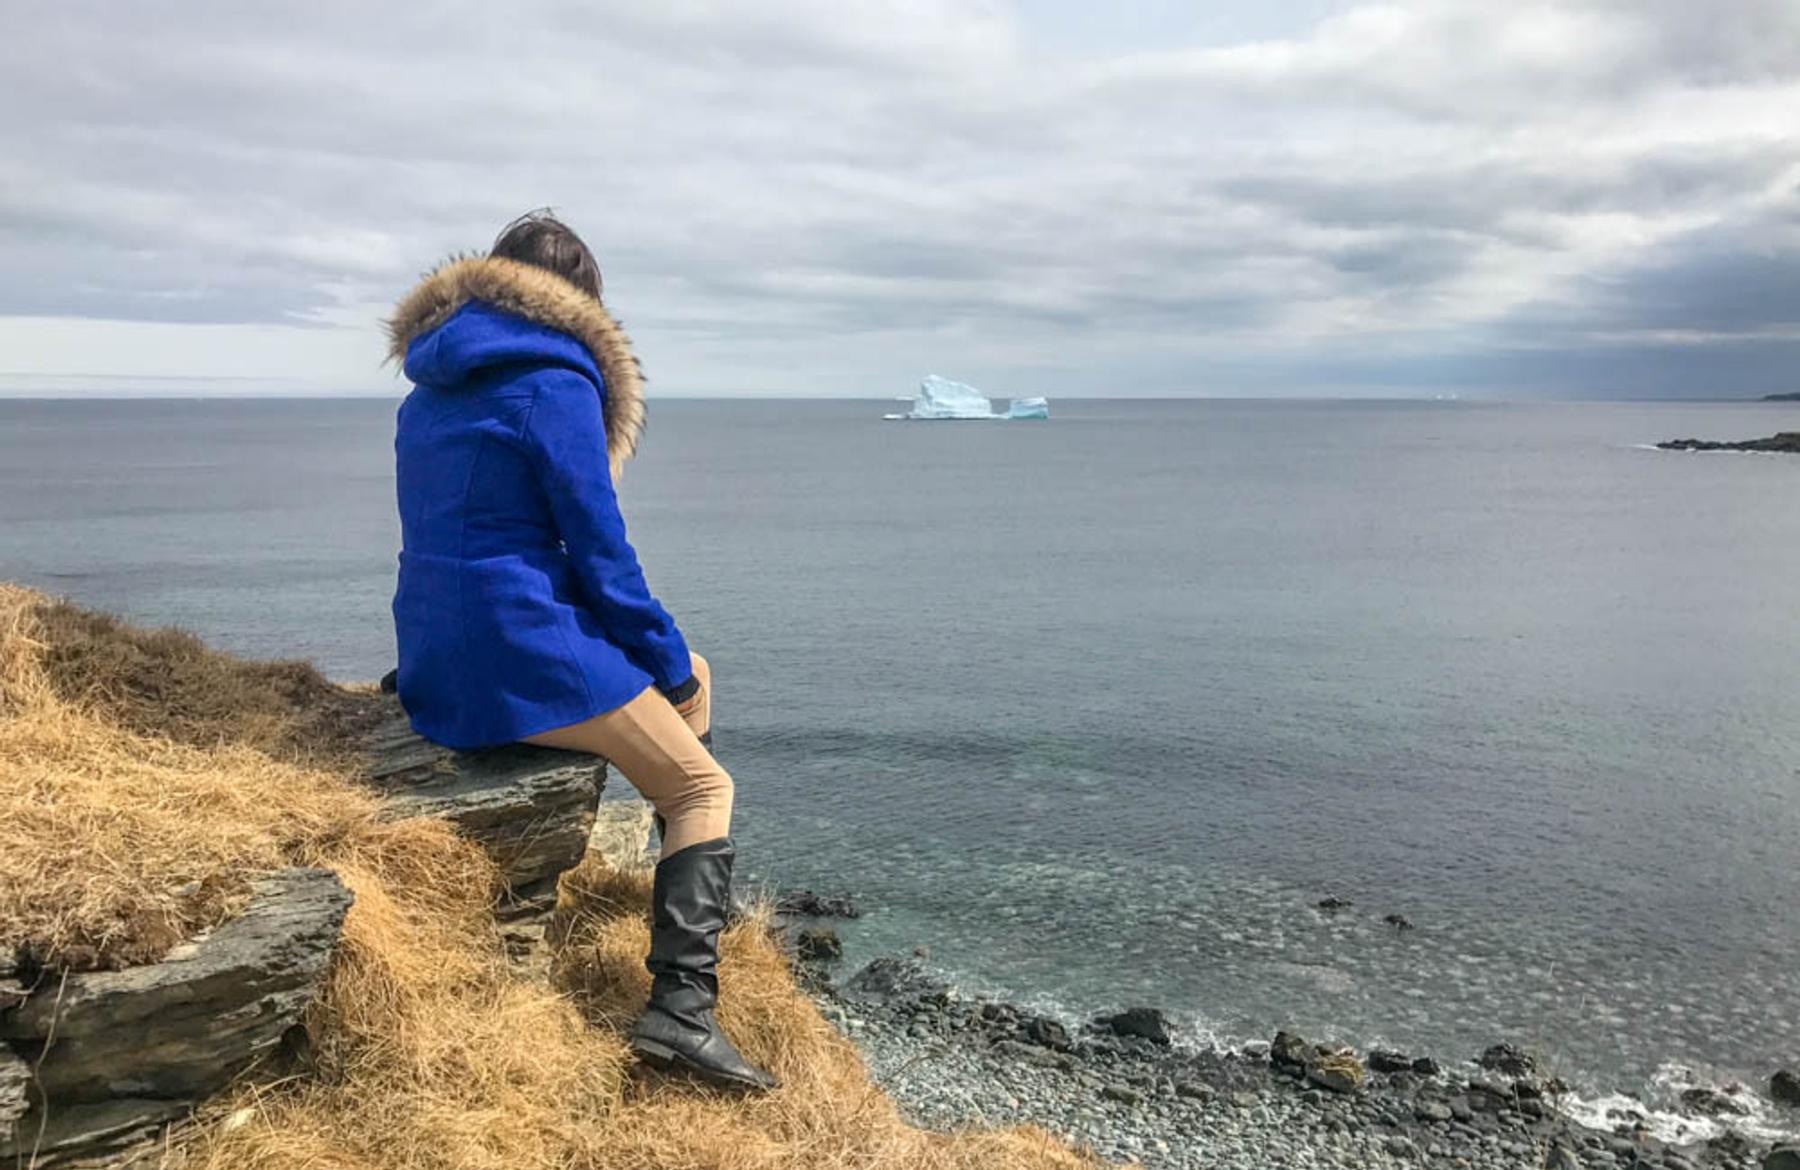 Blogger Lora sitting on a rock by the coastline of Newfoundland in Iceberg Alley, a dream destination in Canada